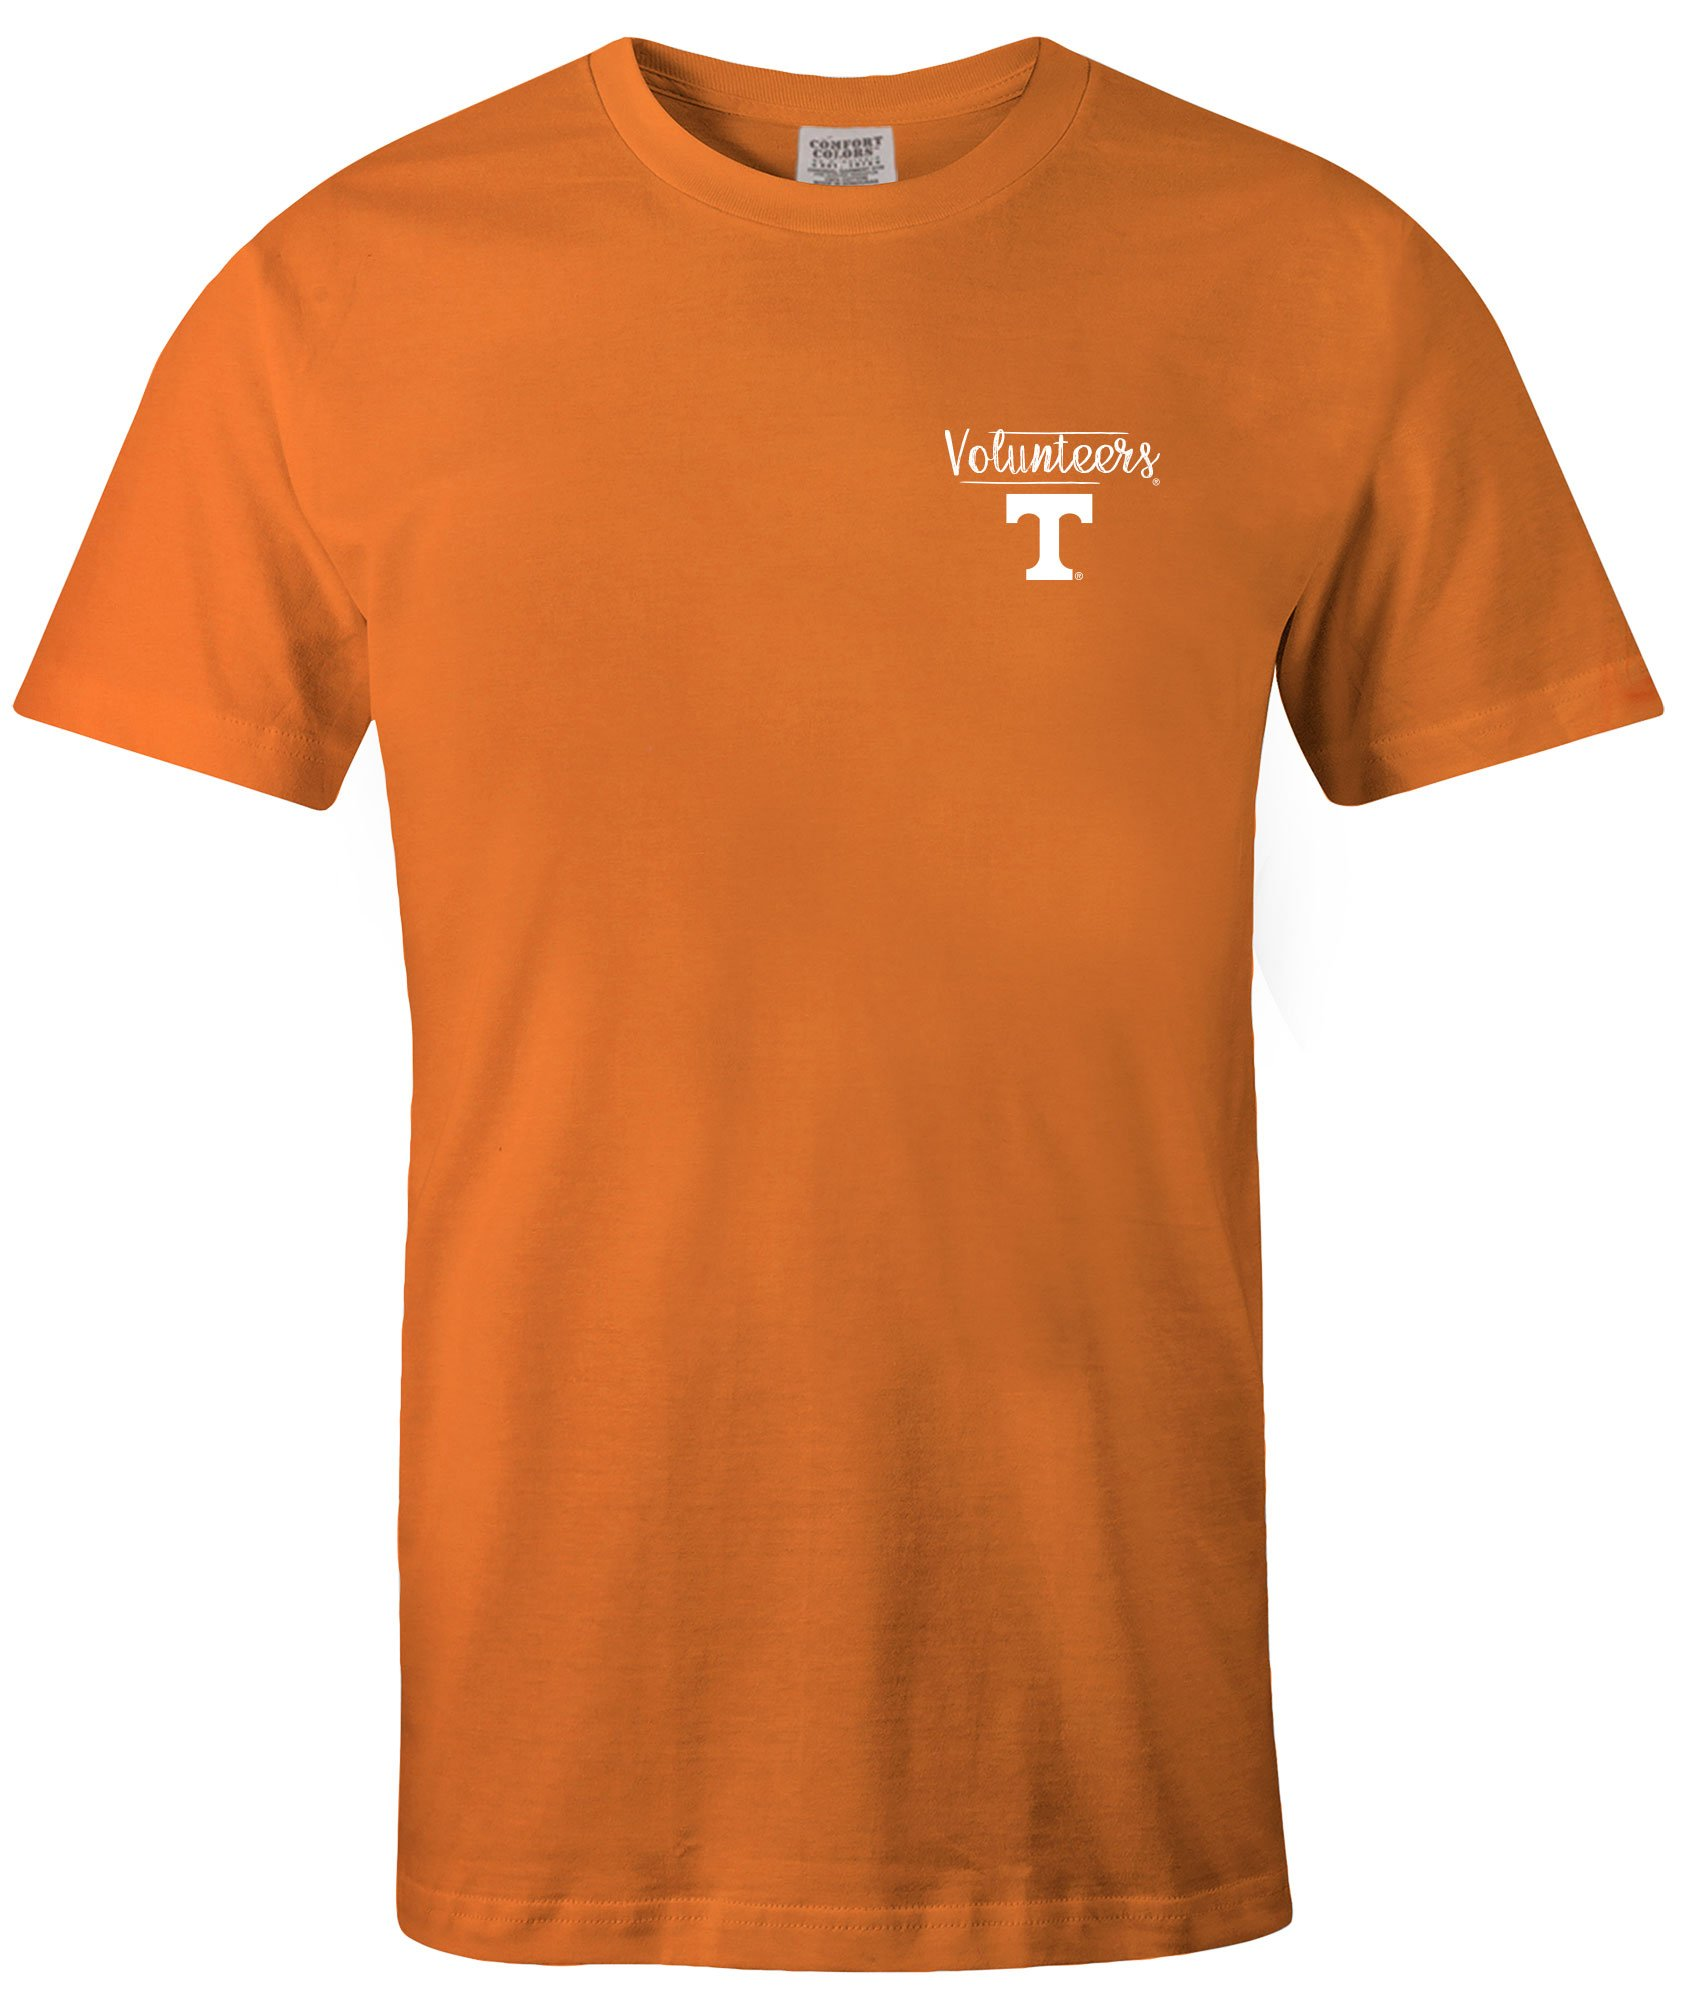 Tennessee Volunteers Sketcok Comfort Color Short Sleeve T Shirt X Tennesseeorange